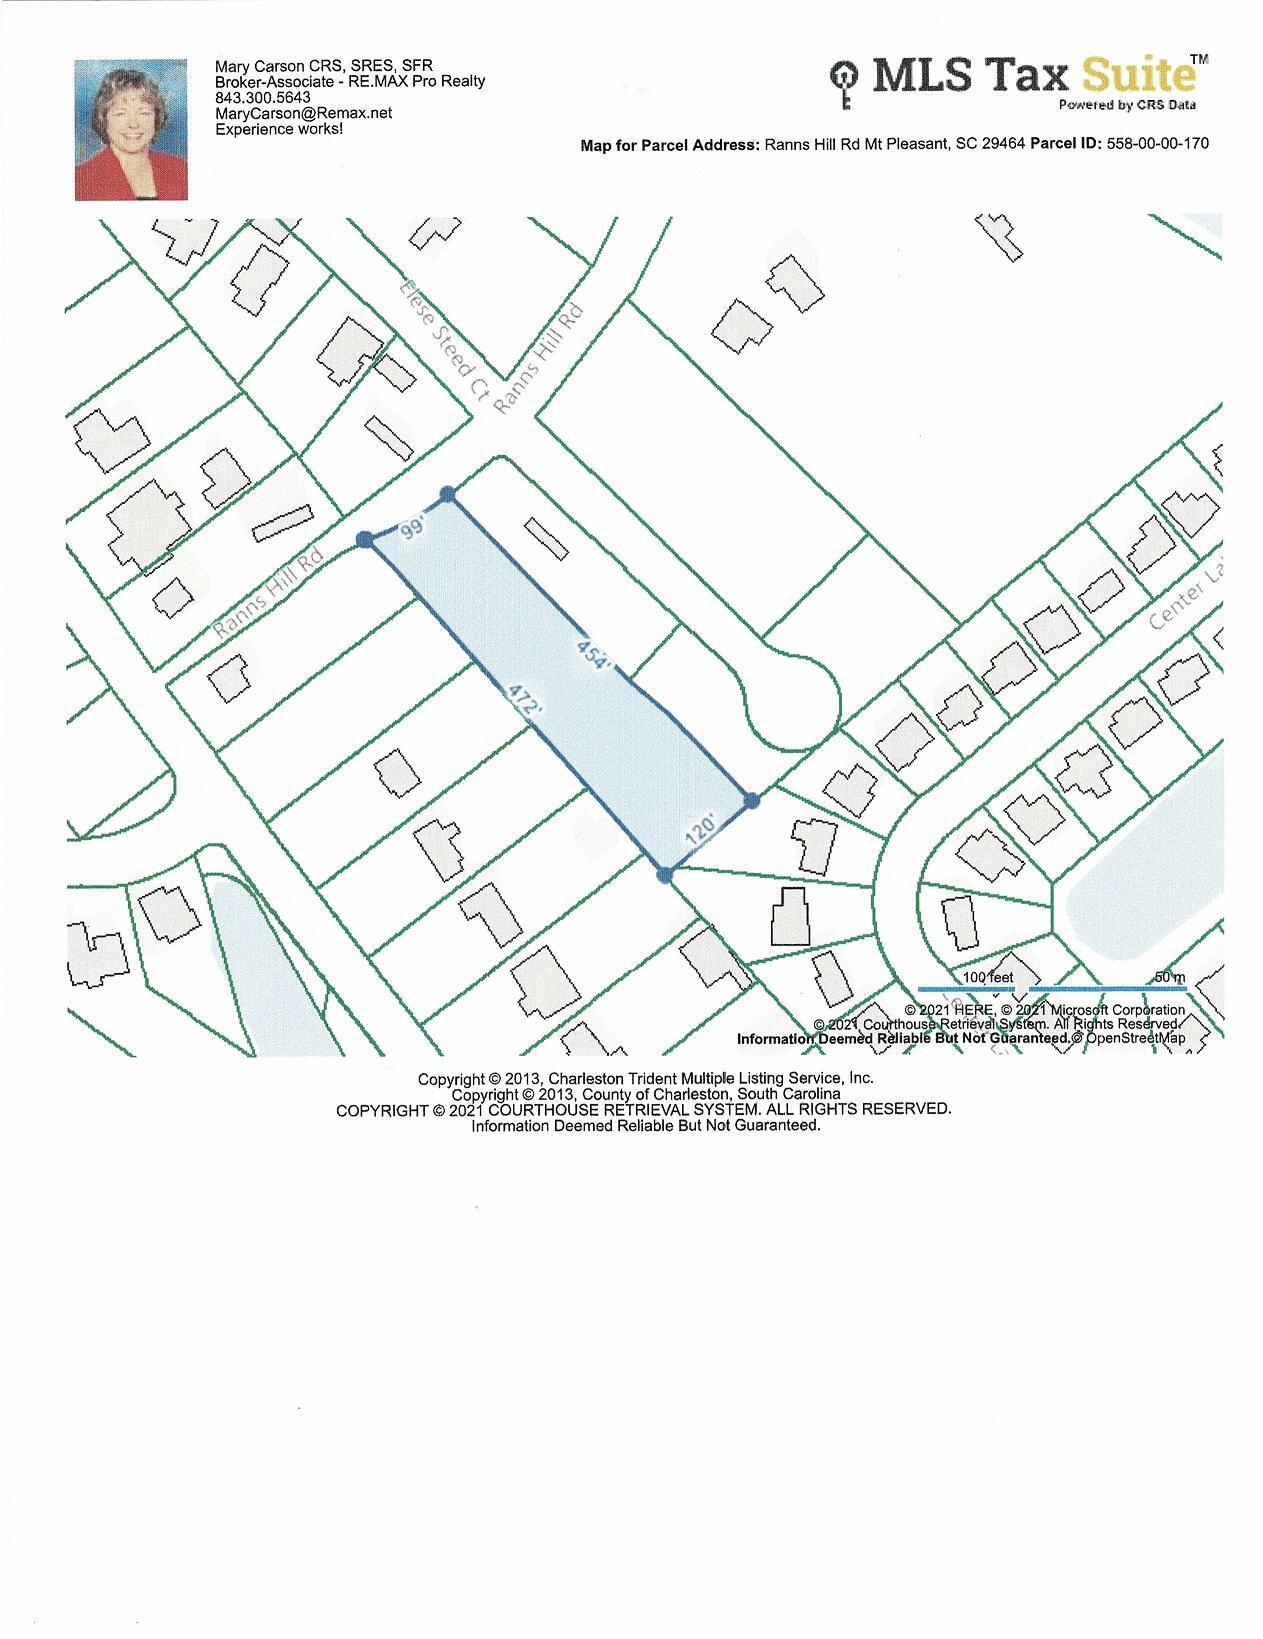 1701 Ranns Hill Road Mount Pleasant, SC 29464